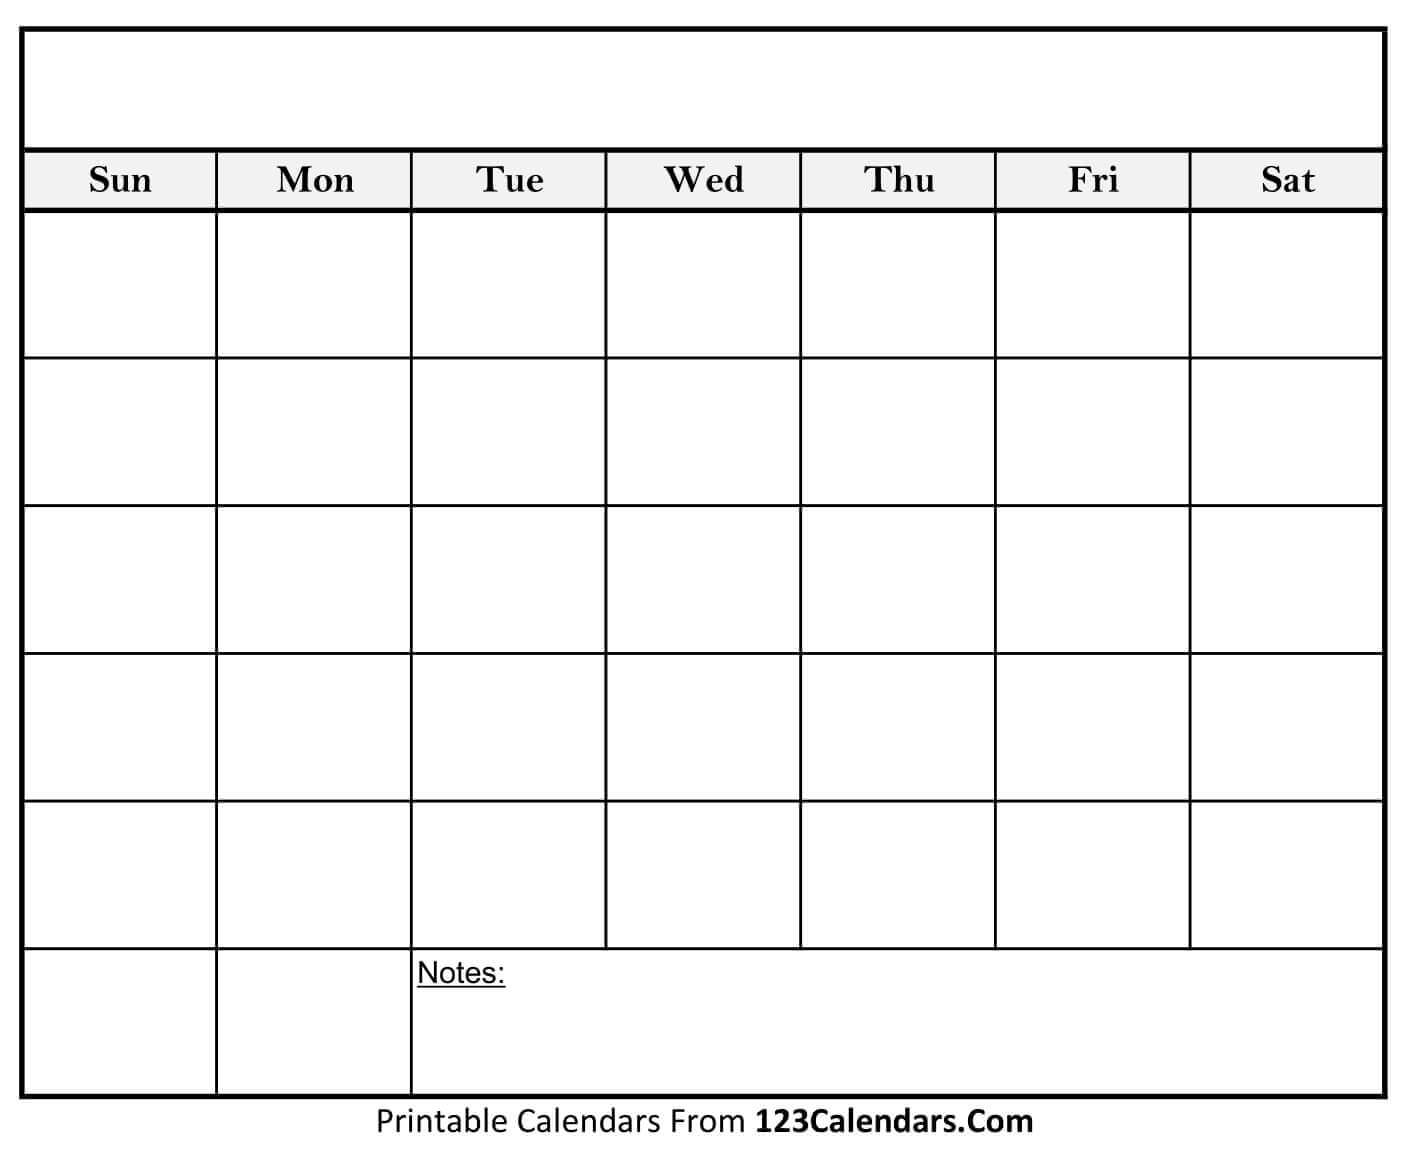 Free Printable Blank Calendar   123Calendars inside Blank Calender Template